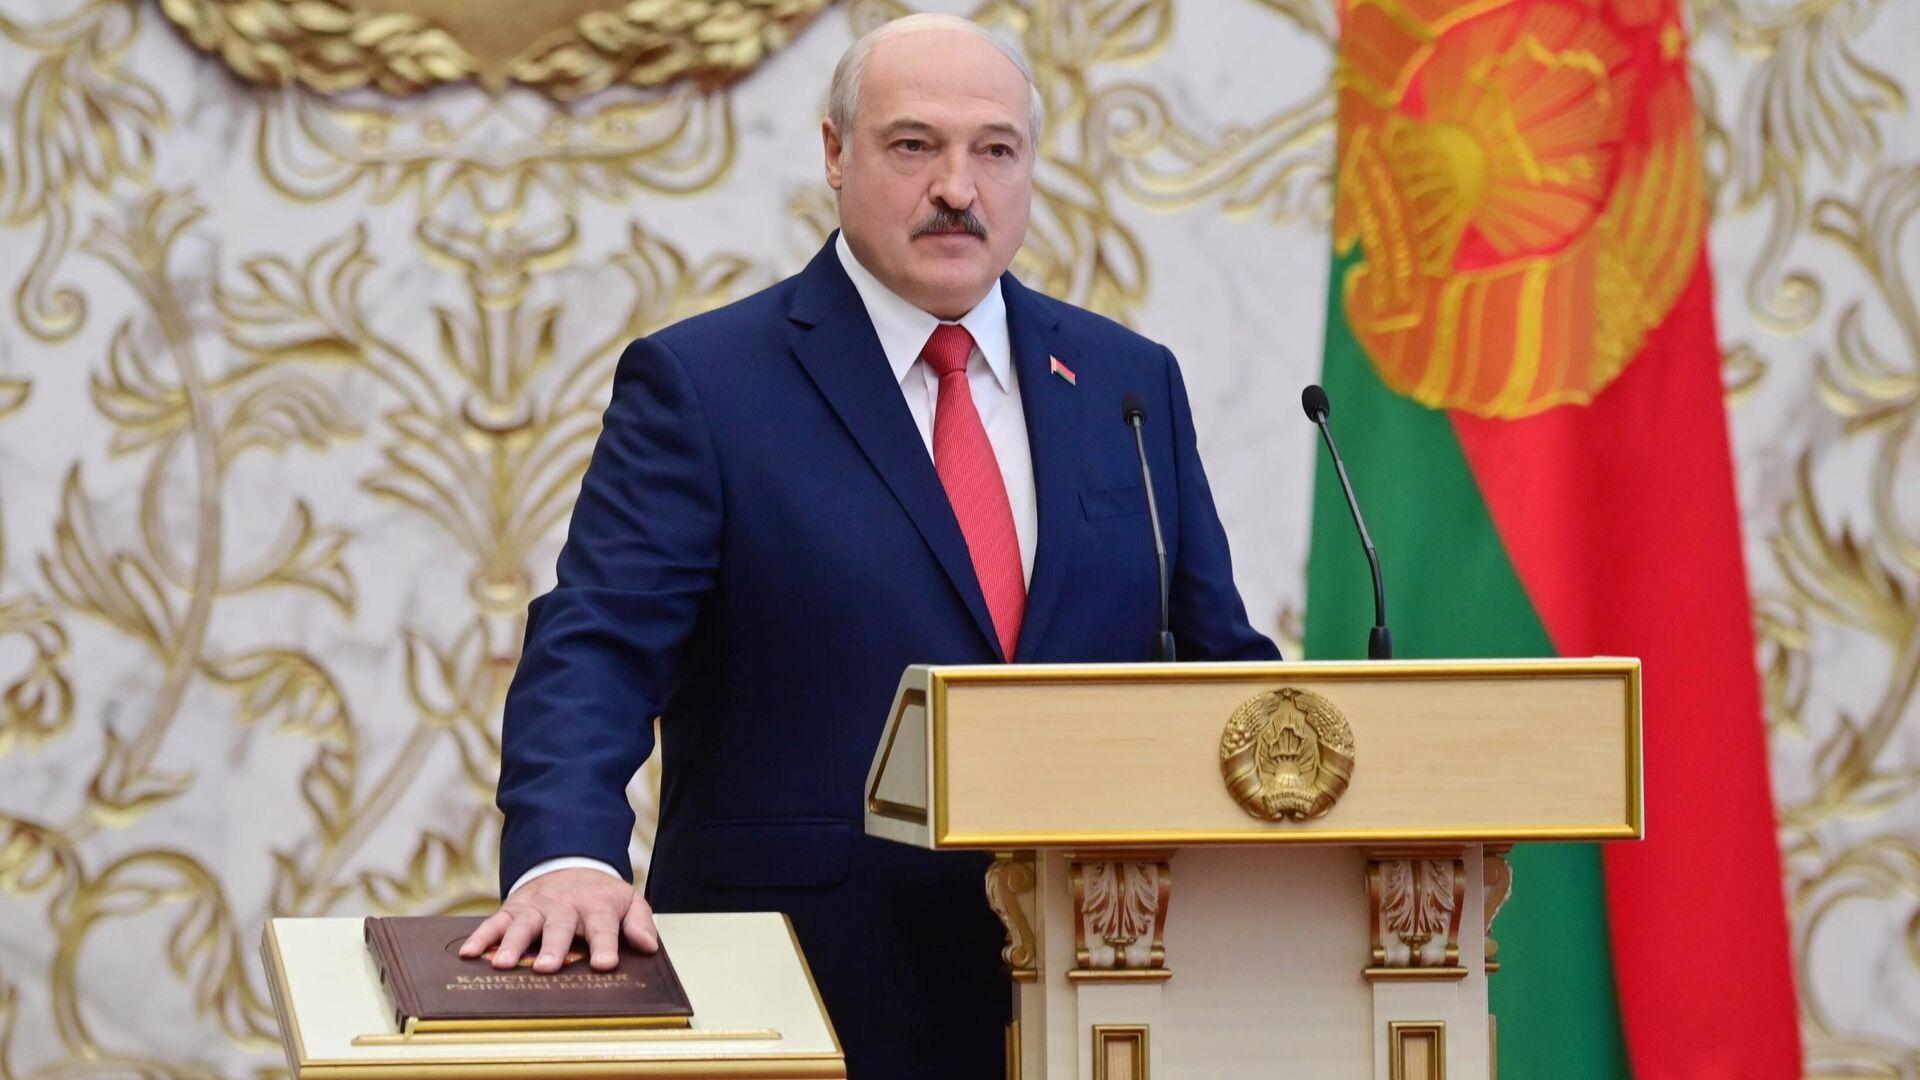 Европарламент призвал как можно скорее ввести санкции против Лукашенко